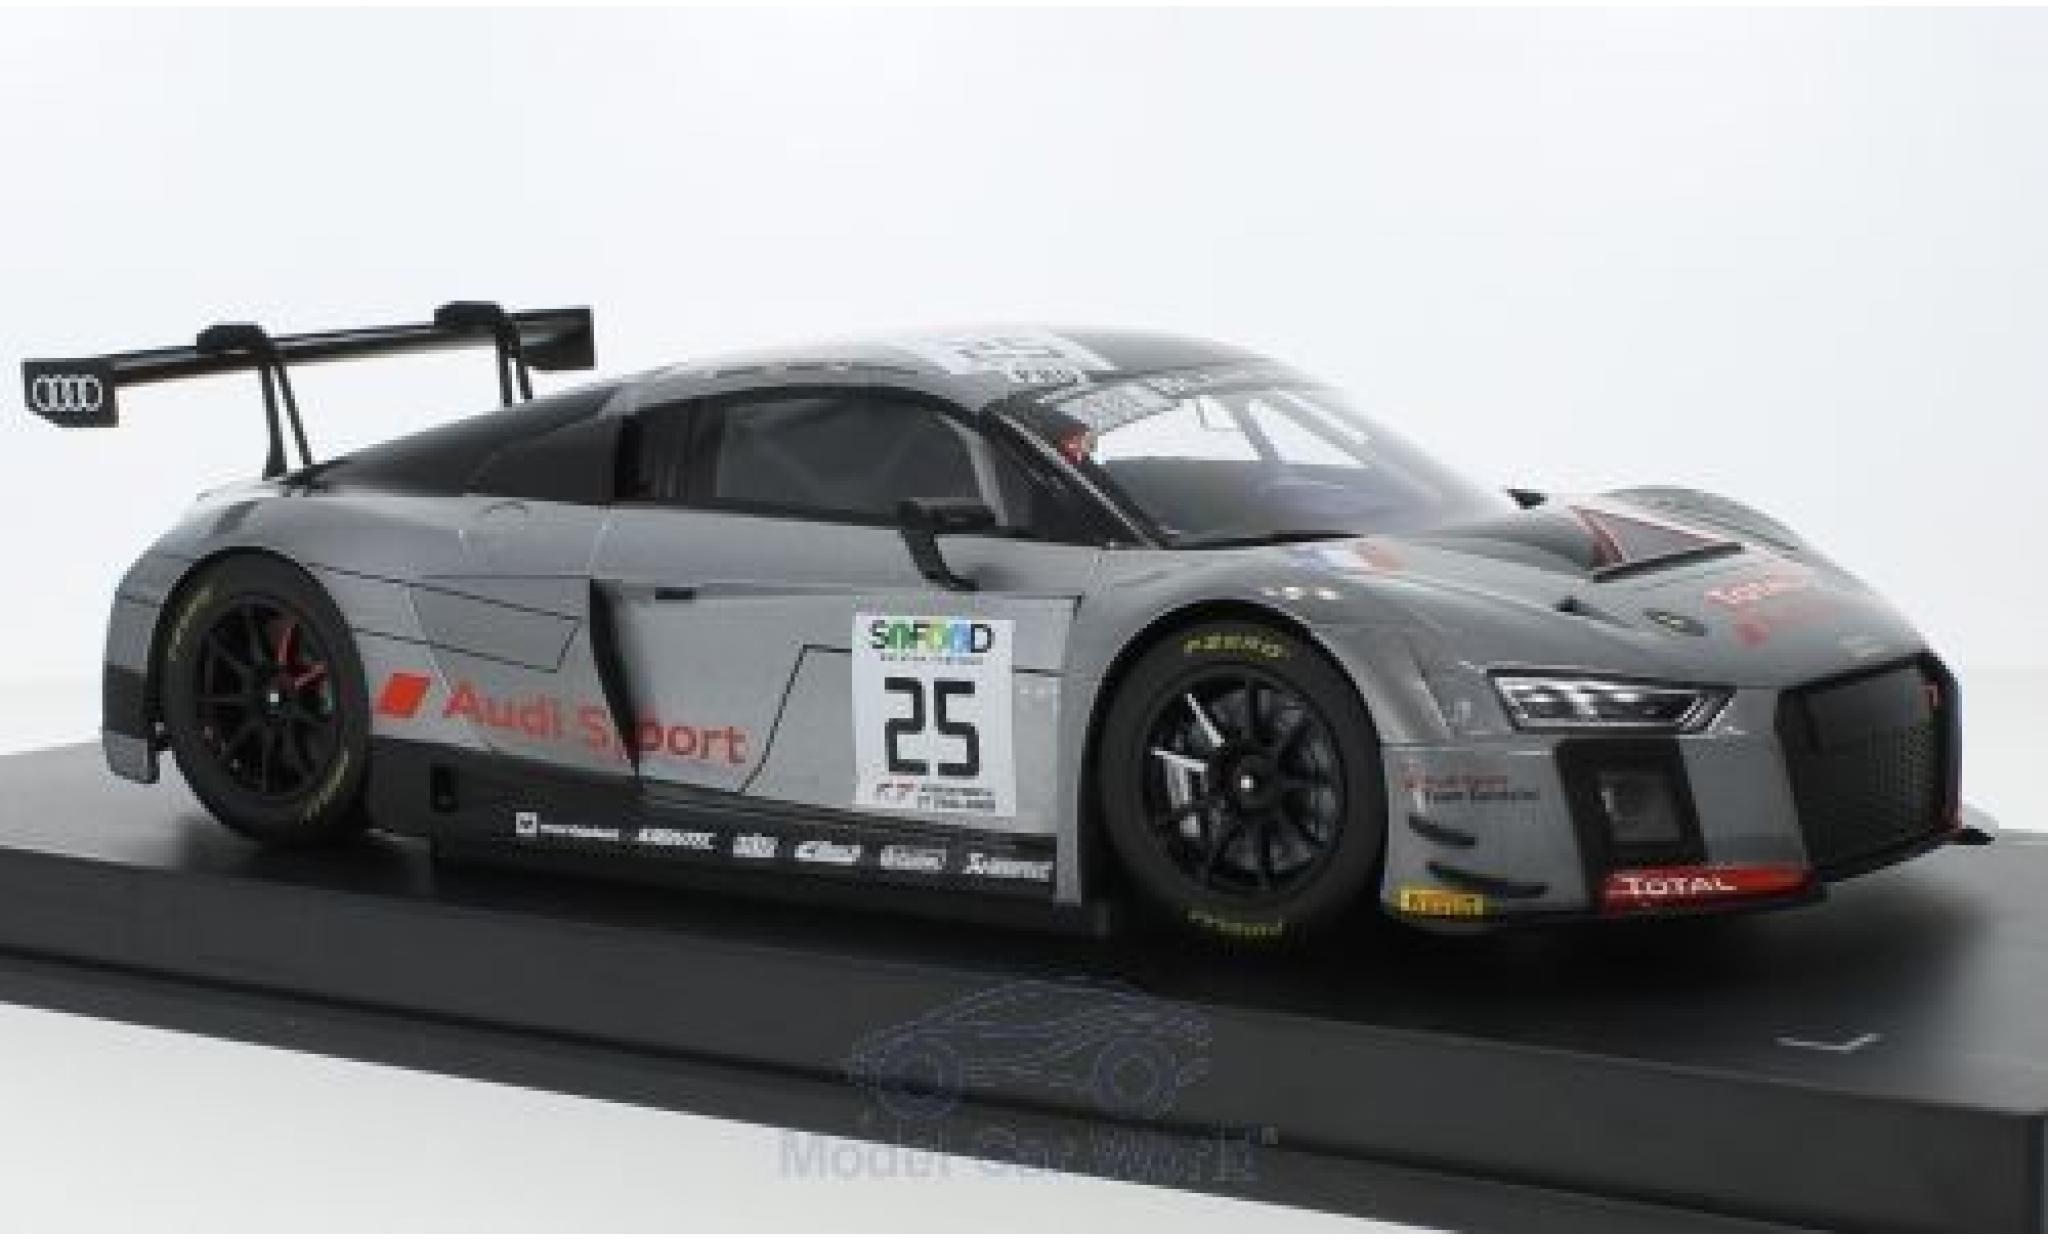 Audi R8 1/18 Paragon LMS No.25 Sainteloc Racing Blancpain Endurance Series 24h Spa Francorchamps 2017 M.Winkelhock/C.Haase/J.Gounon